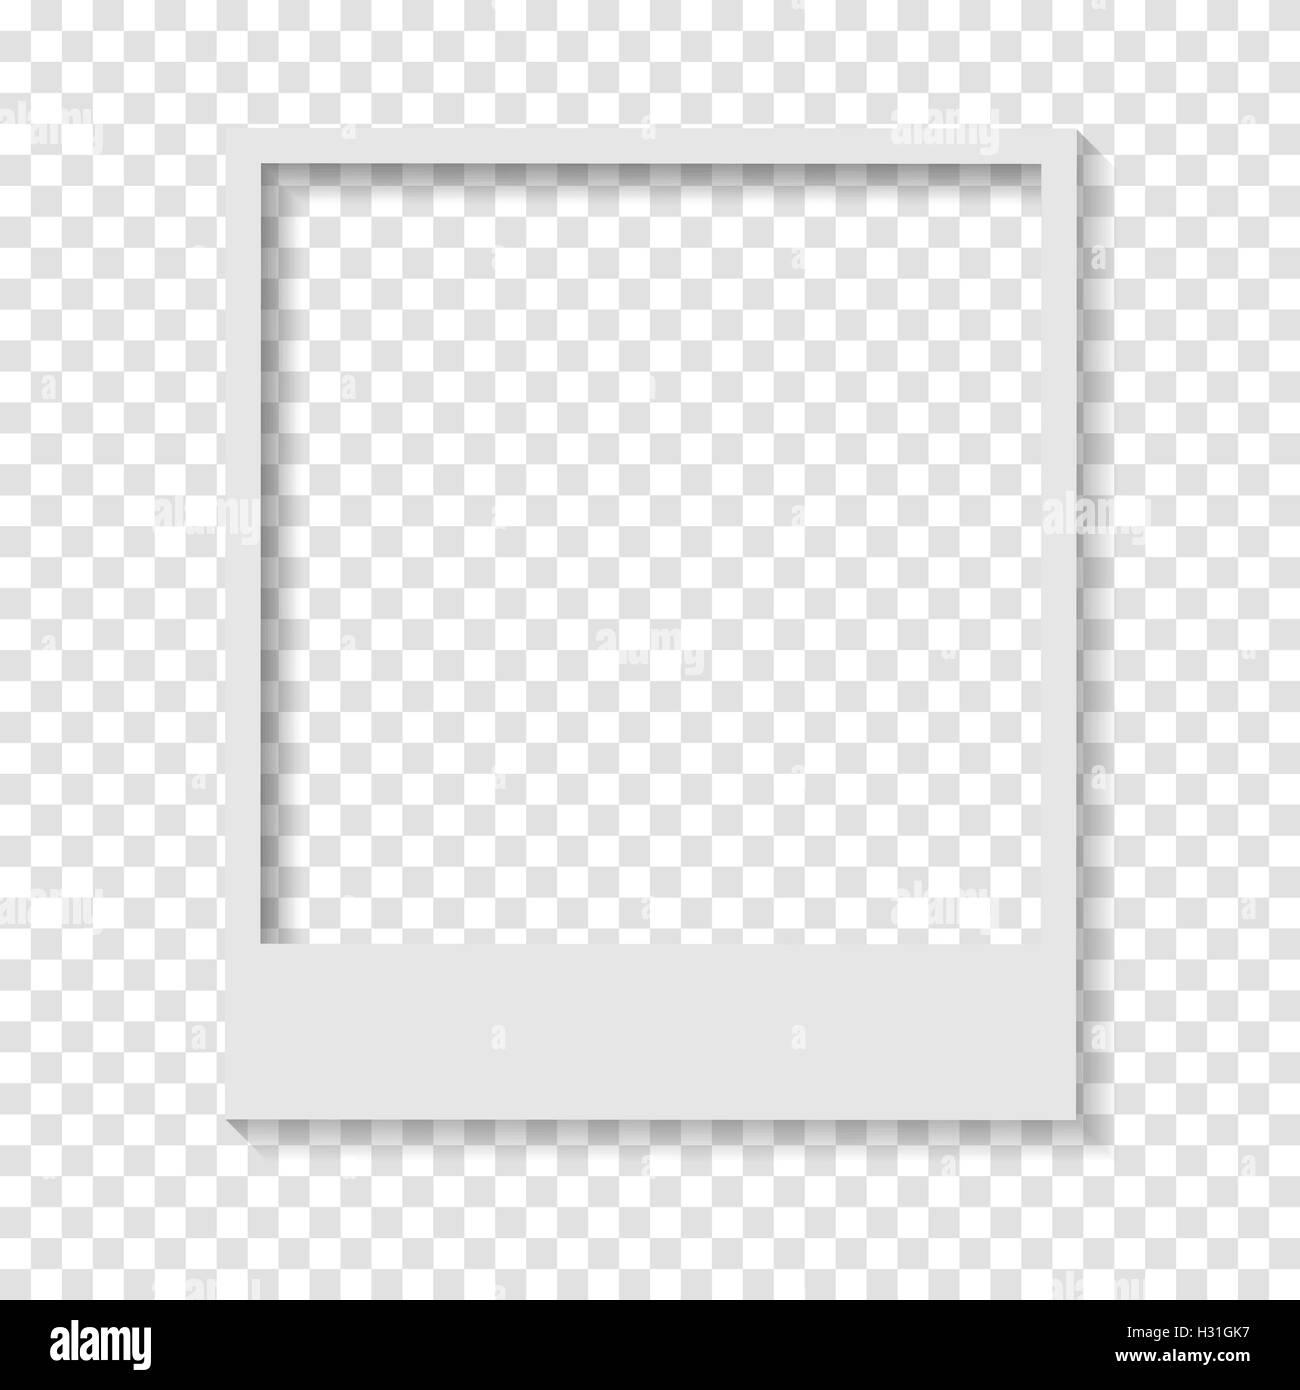 Polaroid paper frames